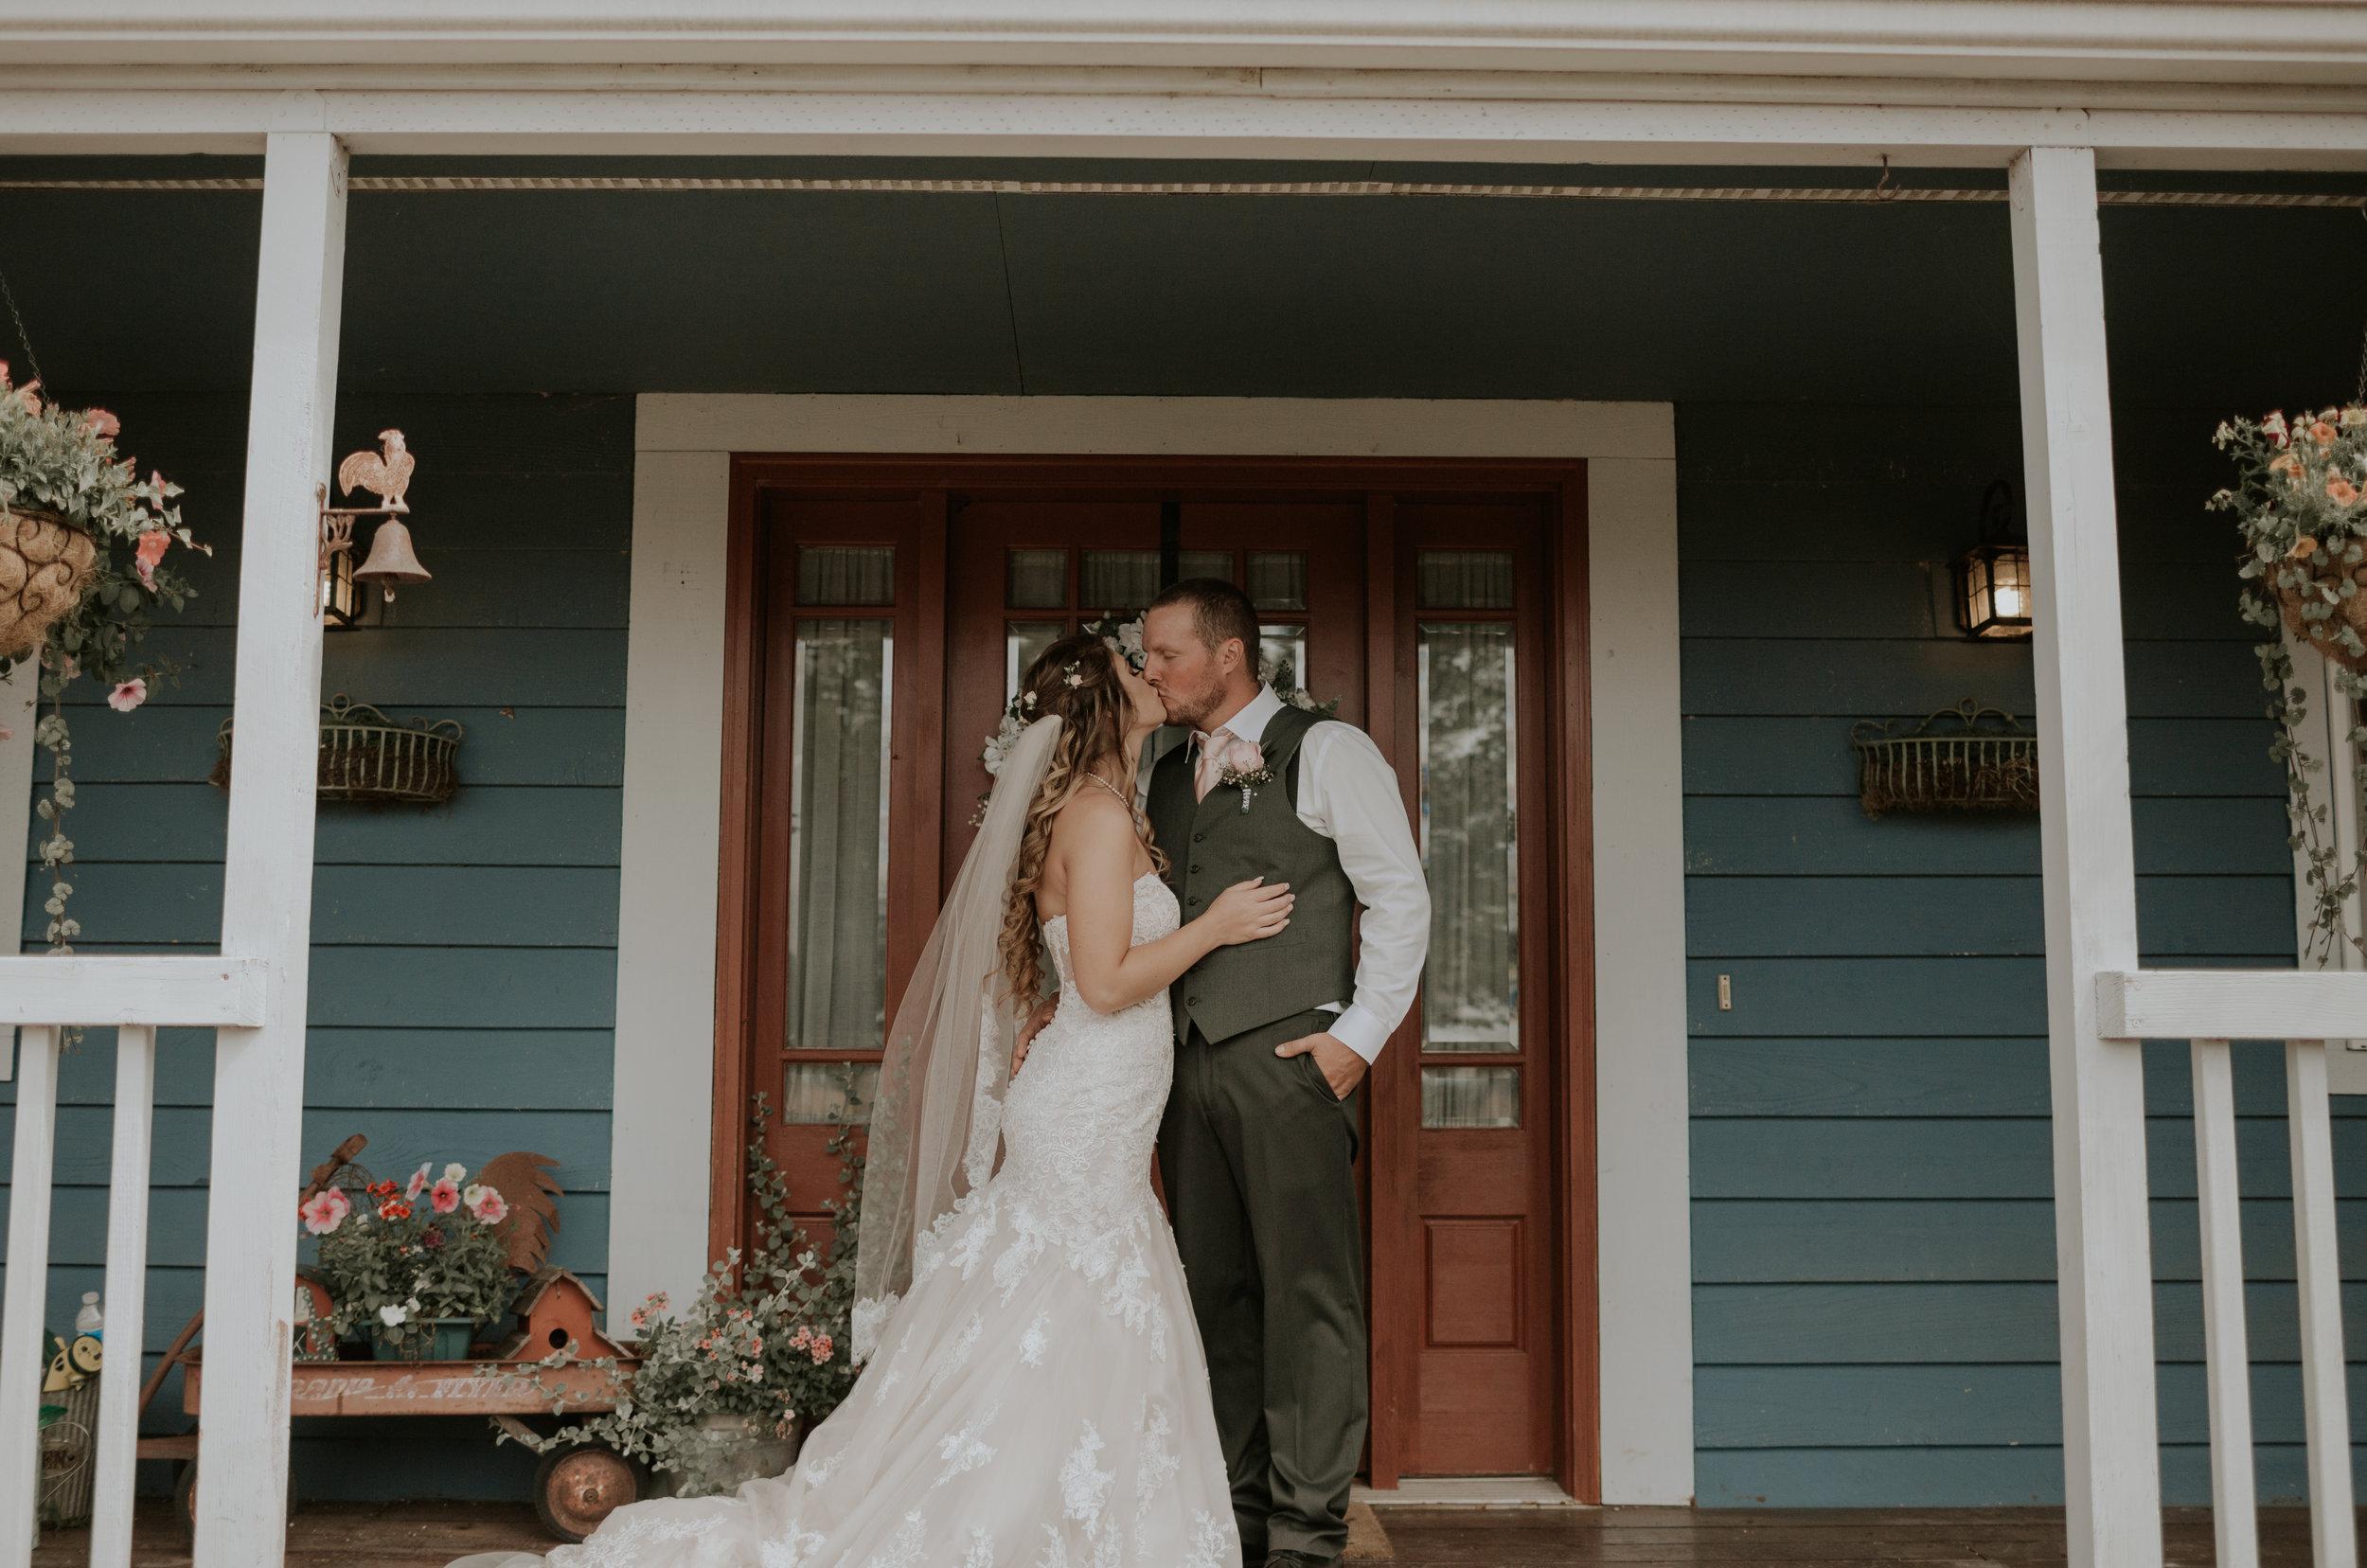 Olympic-Peninsula-Wedding-Photographer-PNW-Forks-Port-Angeles-Kayla-Dawn-Photography-engagement-Olympic-National-Park-126.jpg